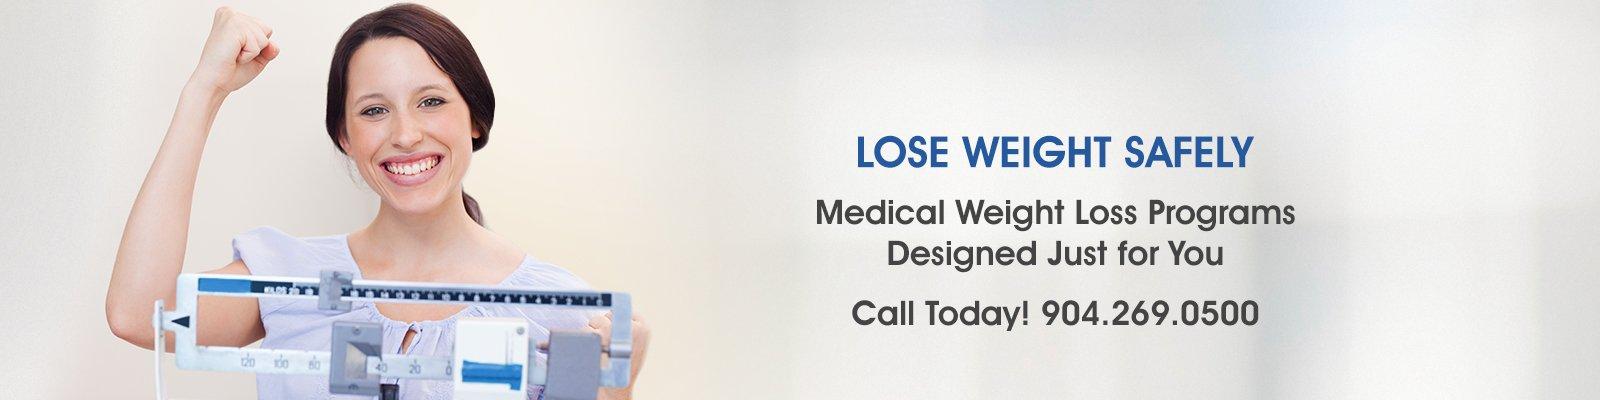 Medical Weight Loss Jacksonville Primemed